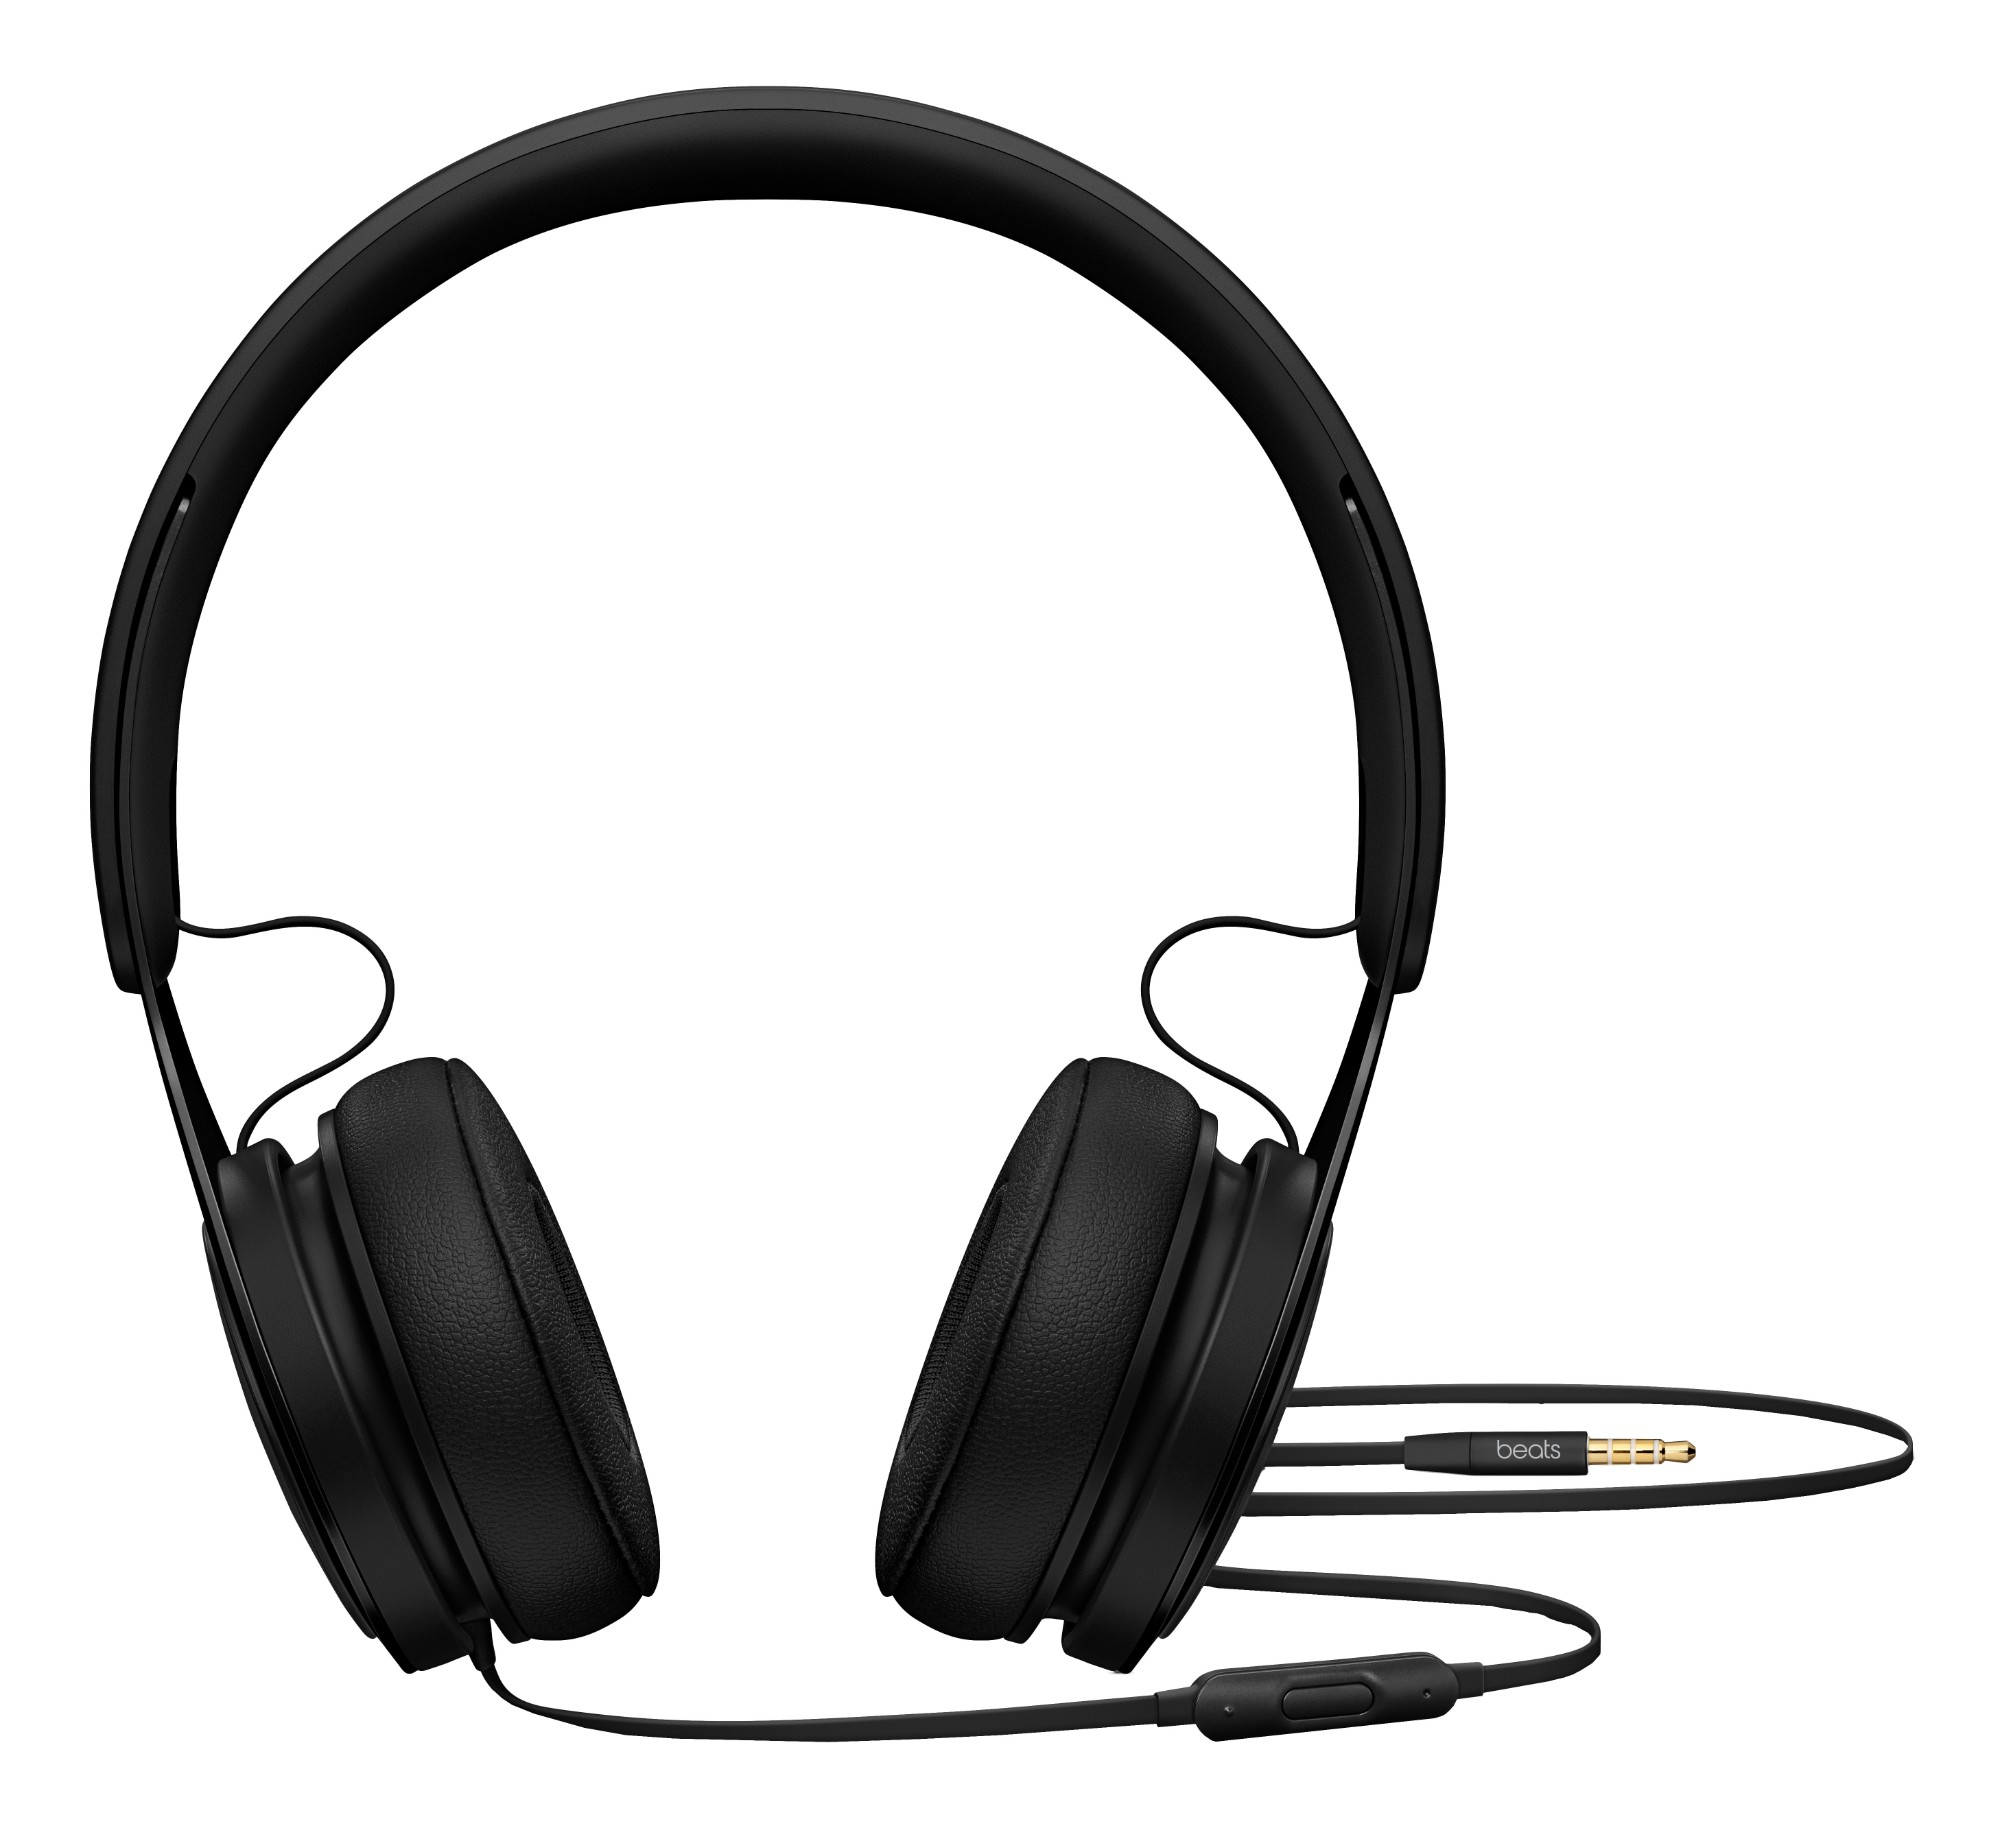 Beats by Dr. Dre Beats EP Auriculares Diadema Negro